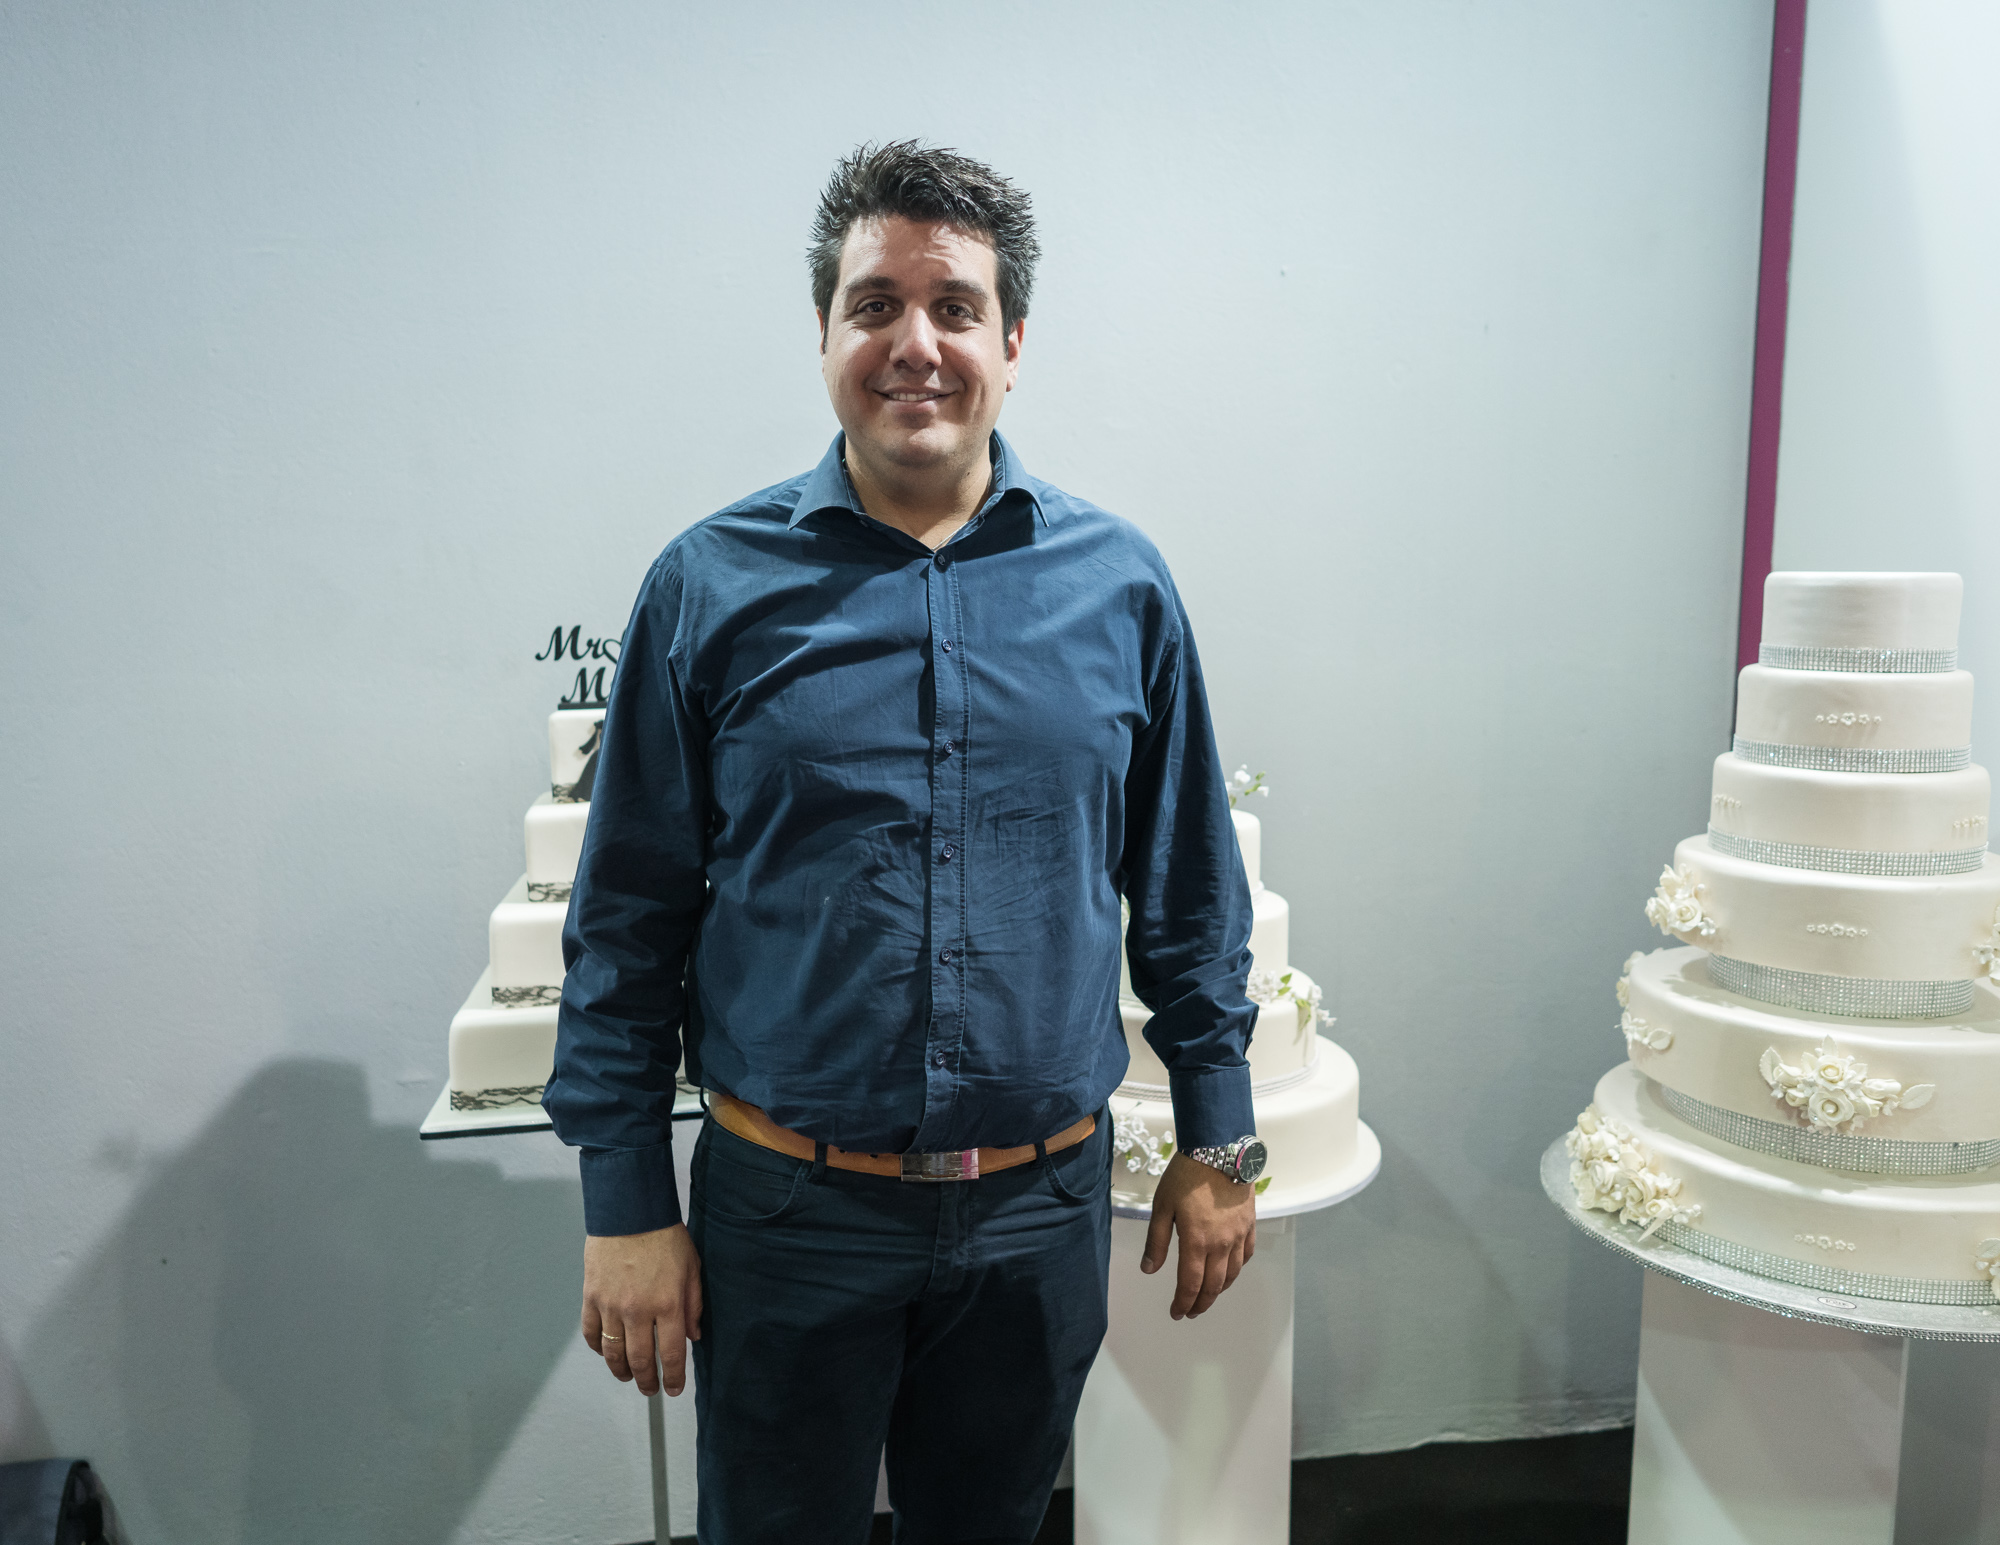 1a896bef1b7 Τούρτα γάμου - «Ασχολούμαστε και με το catering. Όλη η δεξίωση μπορεί να  φτάσει μέχρι τις 15.000 ευρώ»